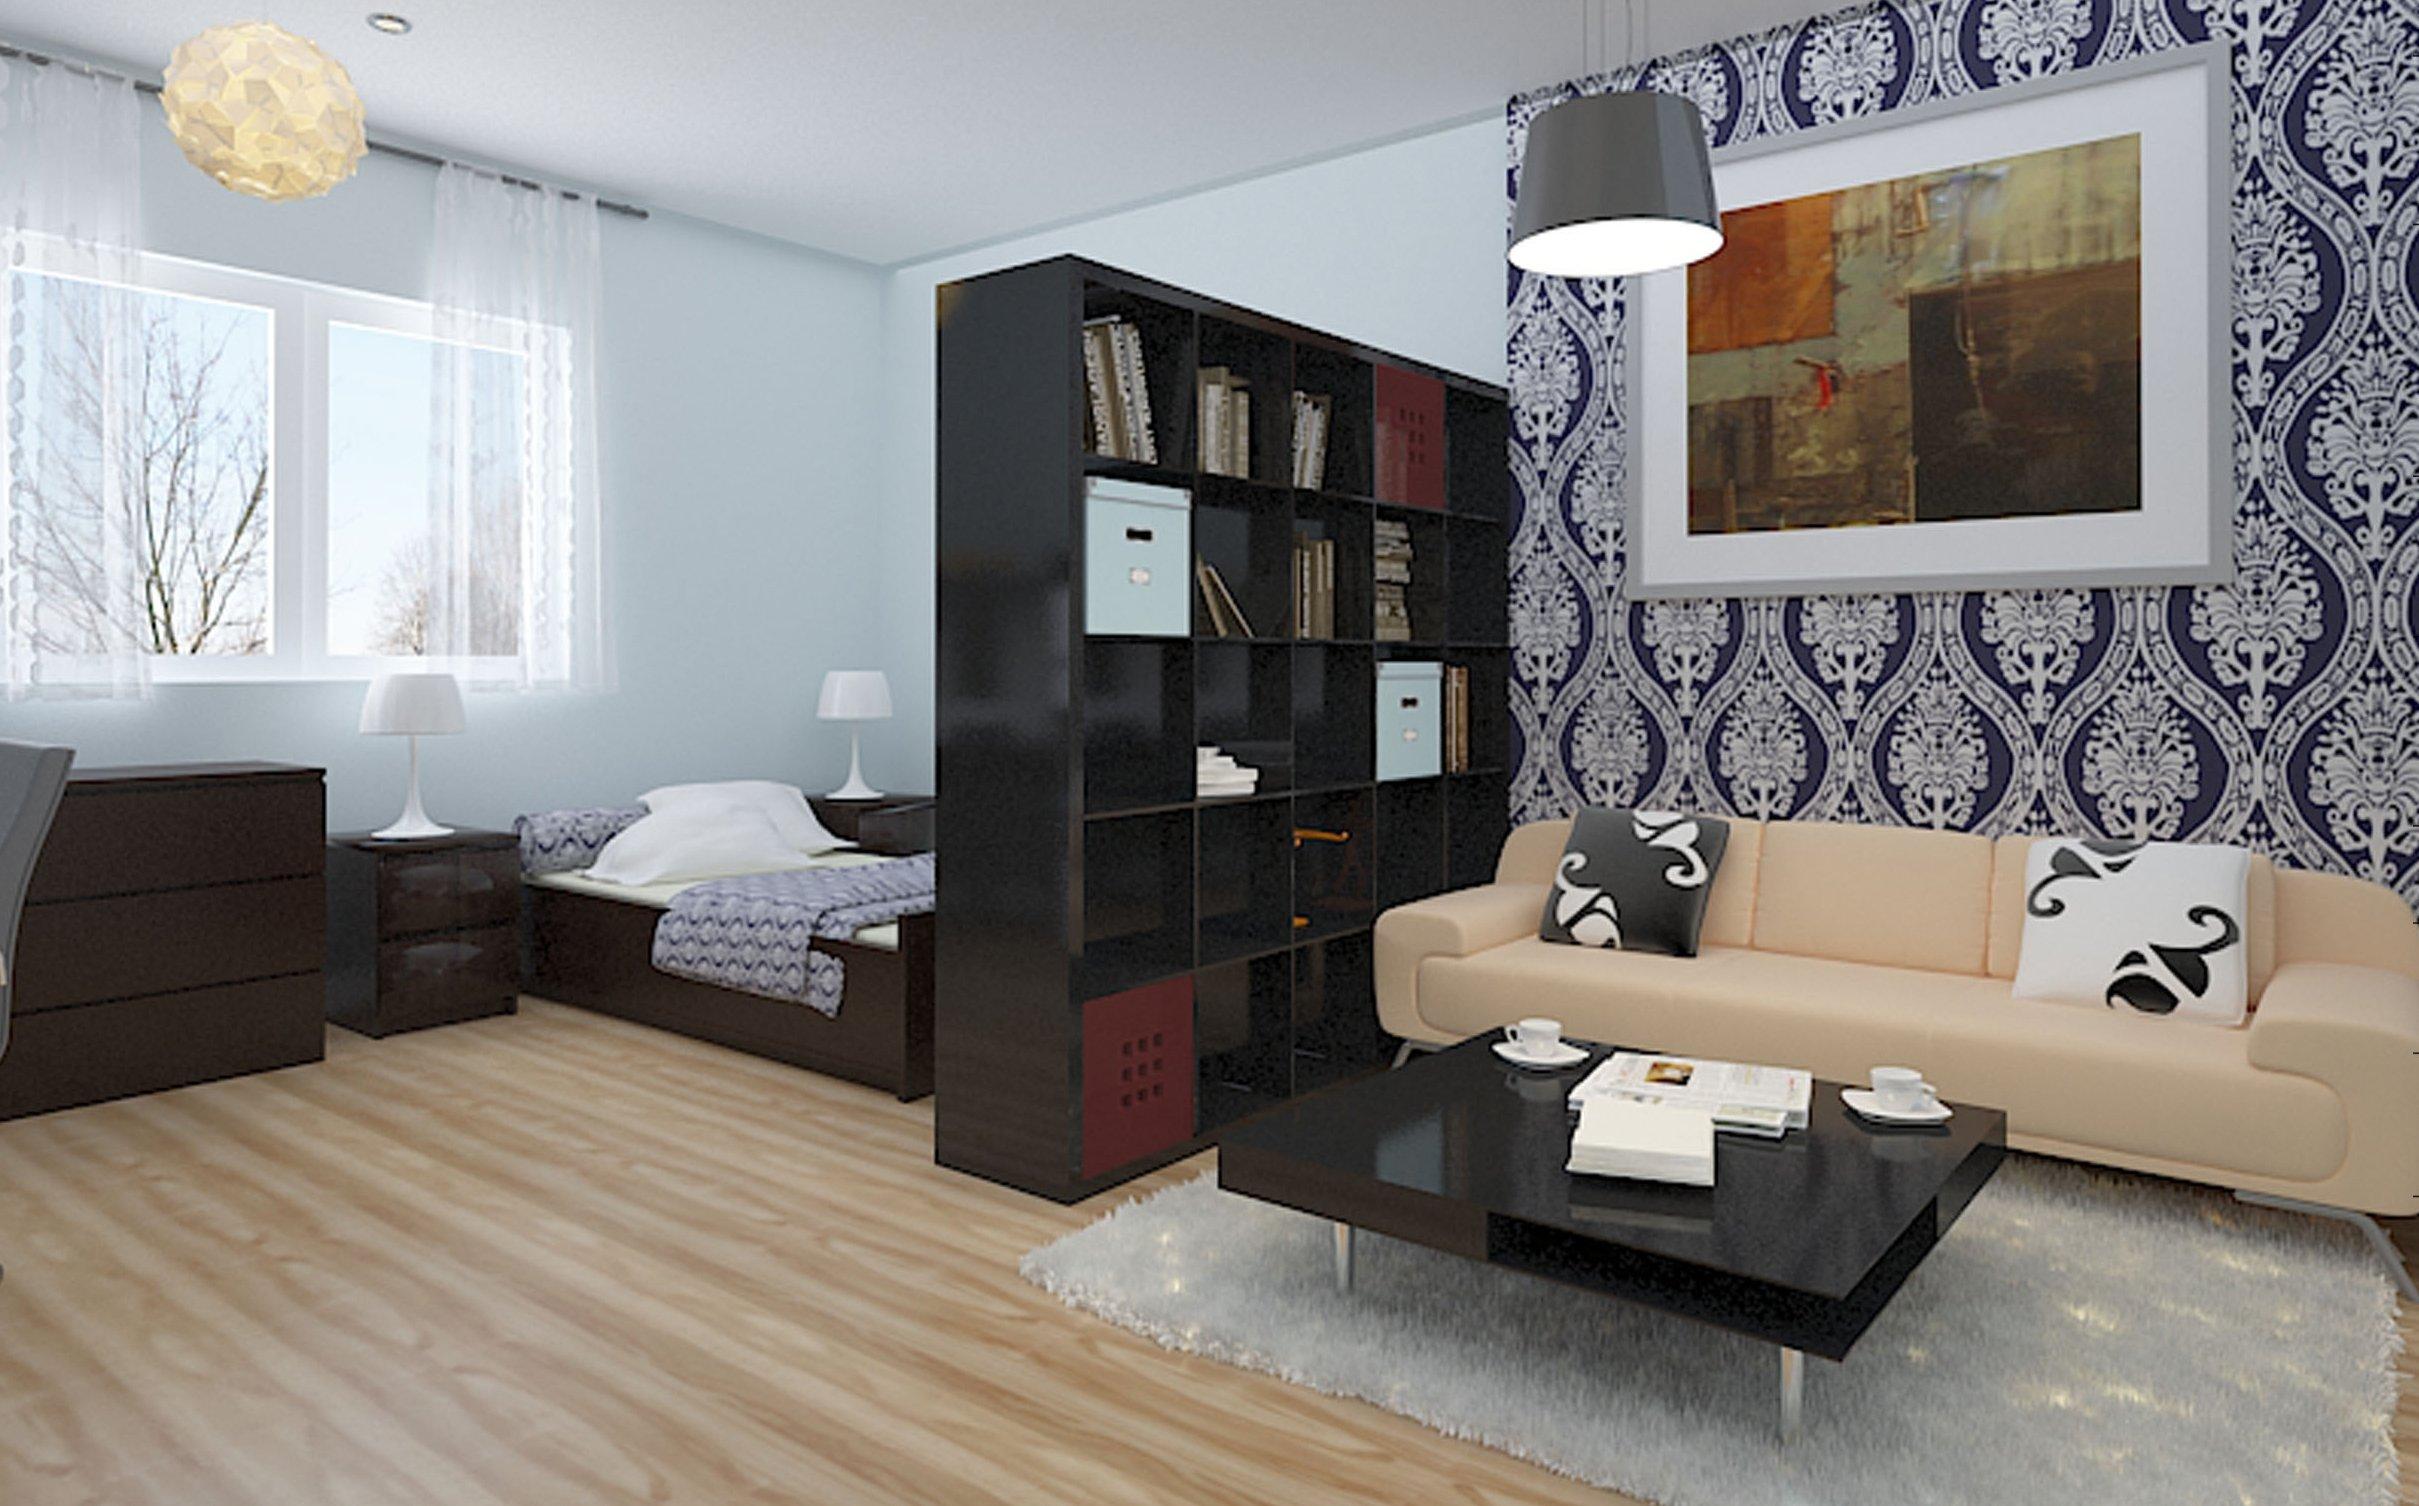 10 Ideal Small Studio Apartment Decorating Ideas studio apartments design internetunblock internetunblock 2020